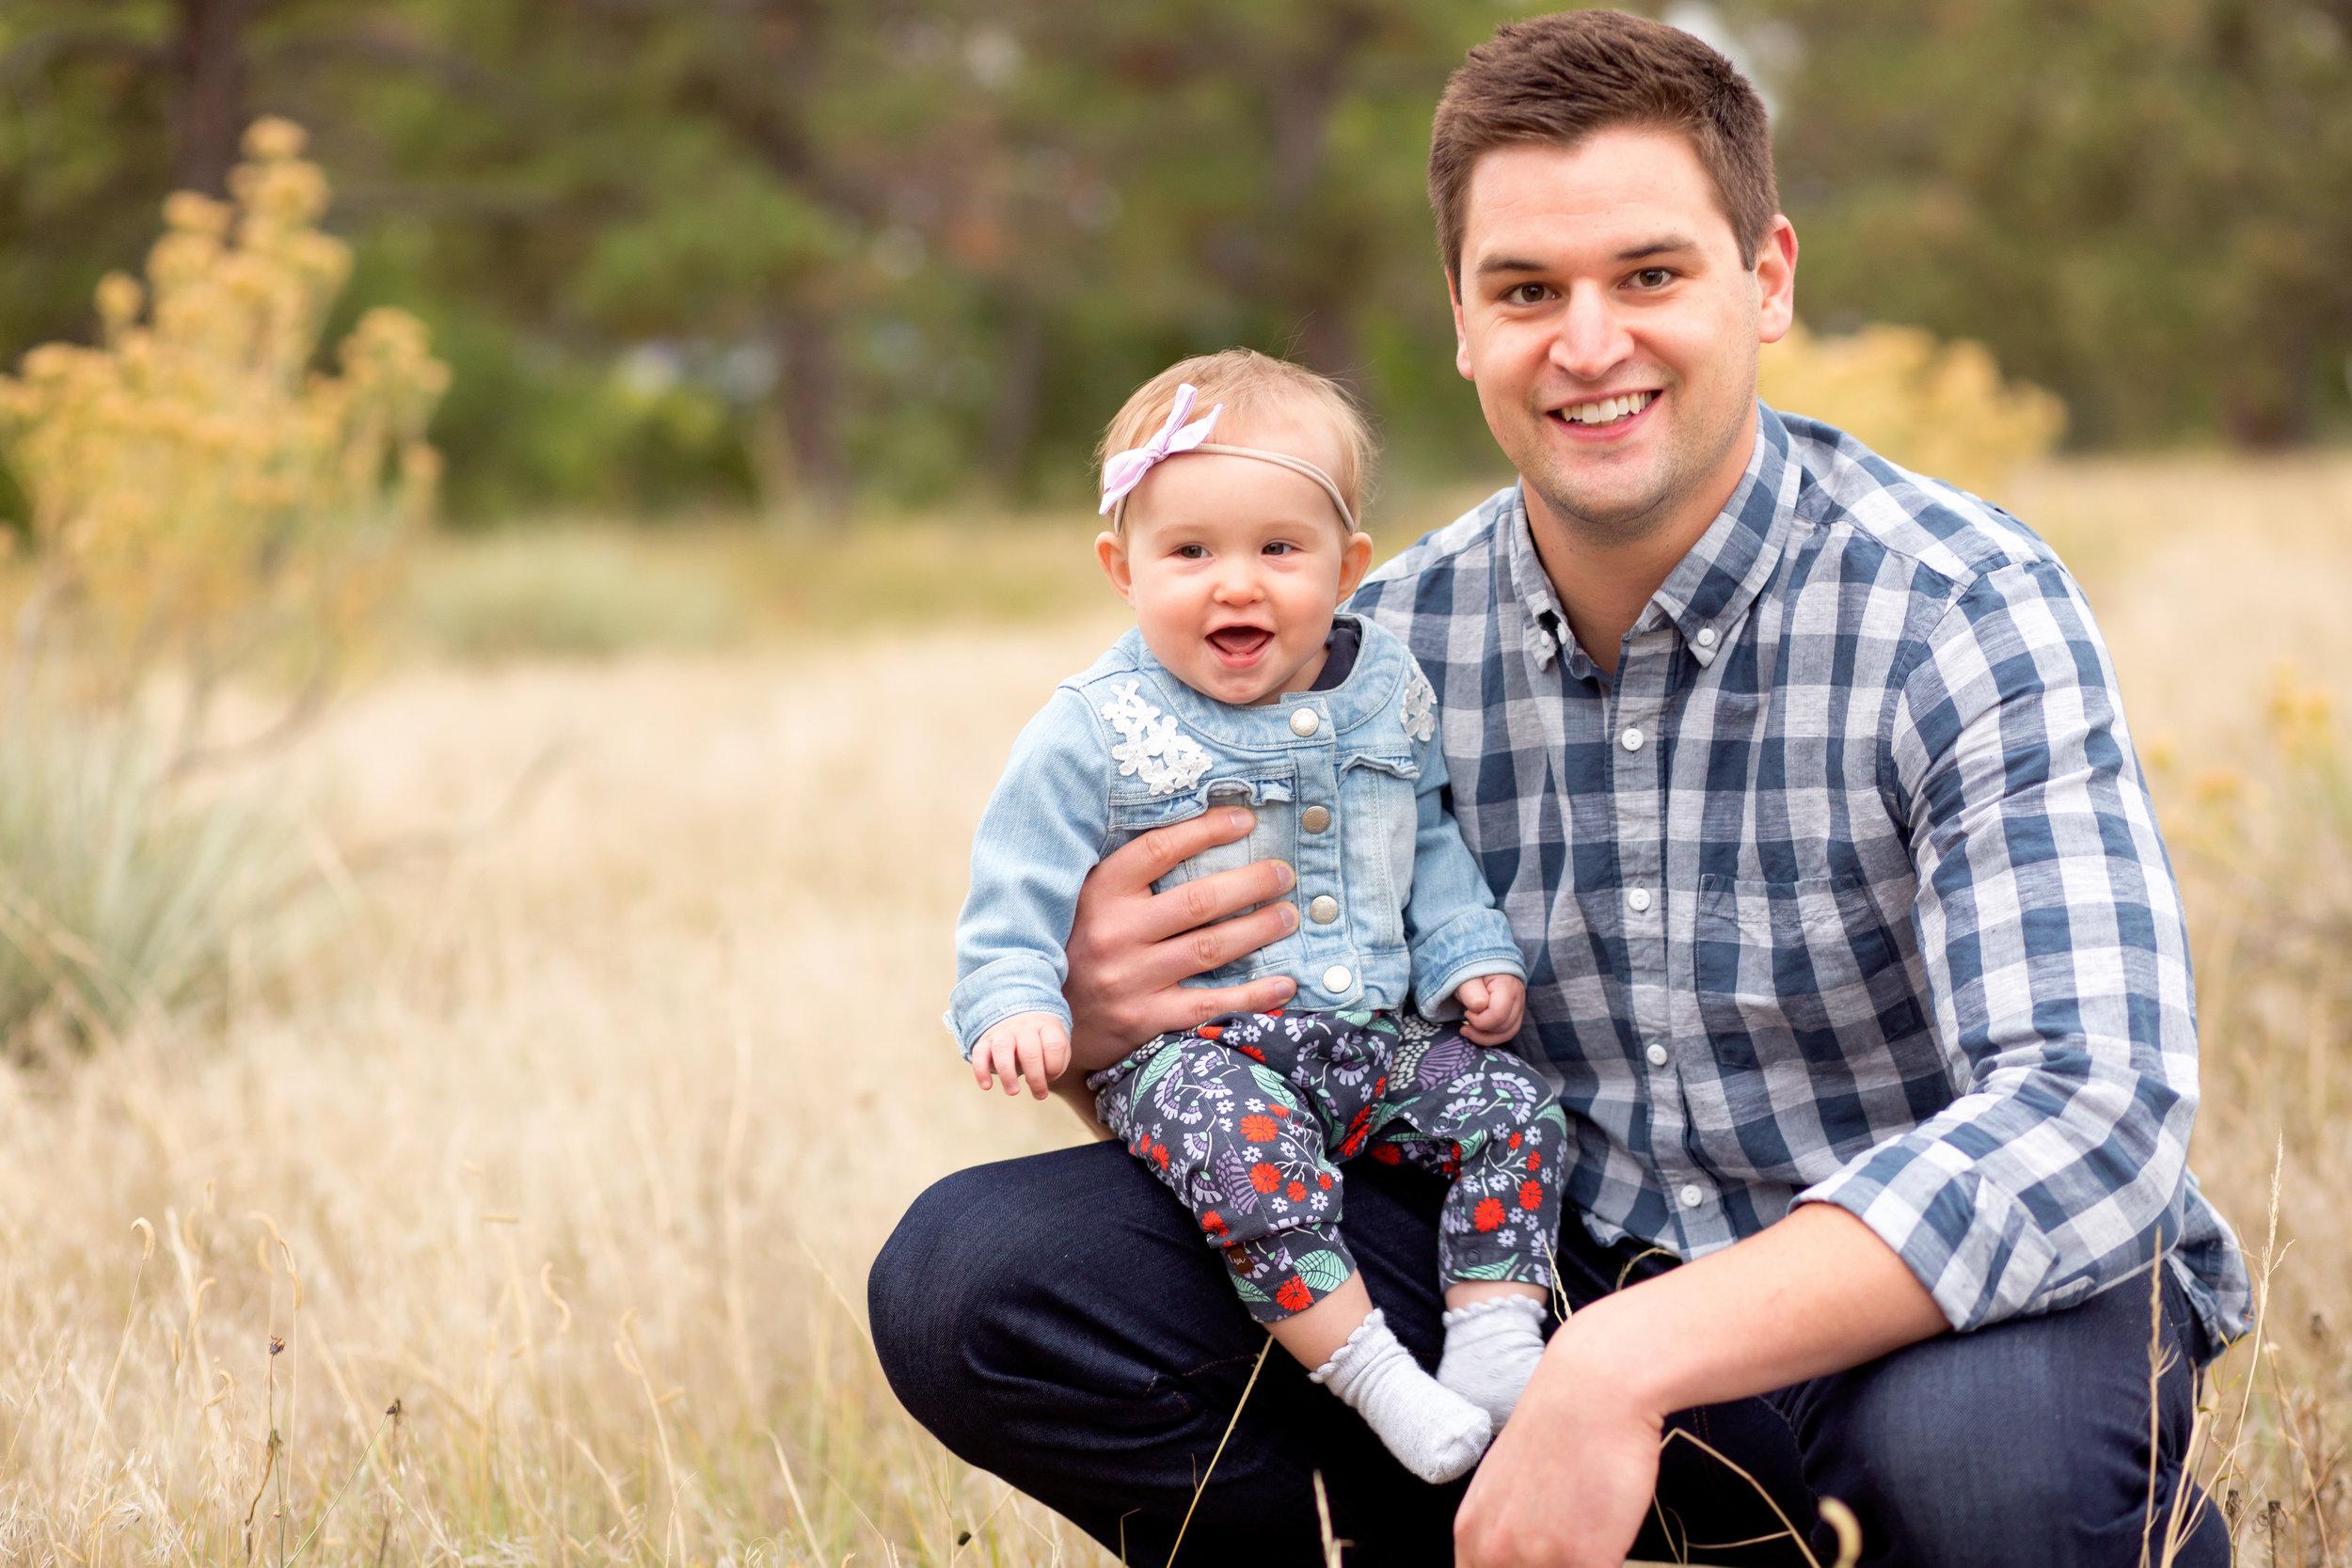 Denver Maternity Photographer, Denver Newborn Photographer, Boulder Maternity Photographers, Boulder Newborn Photographers